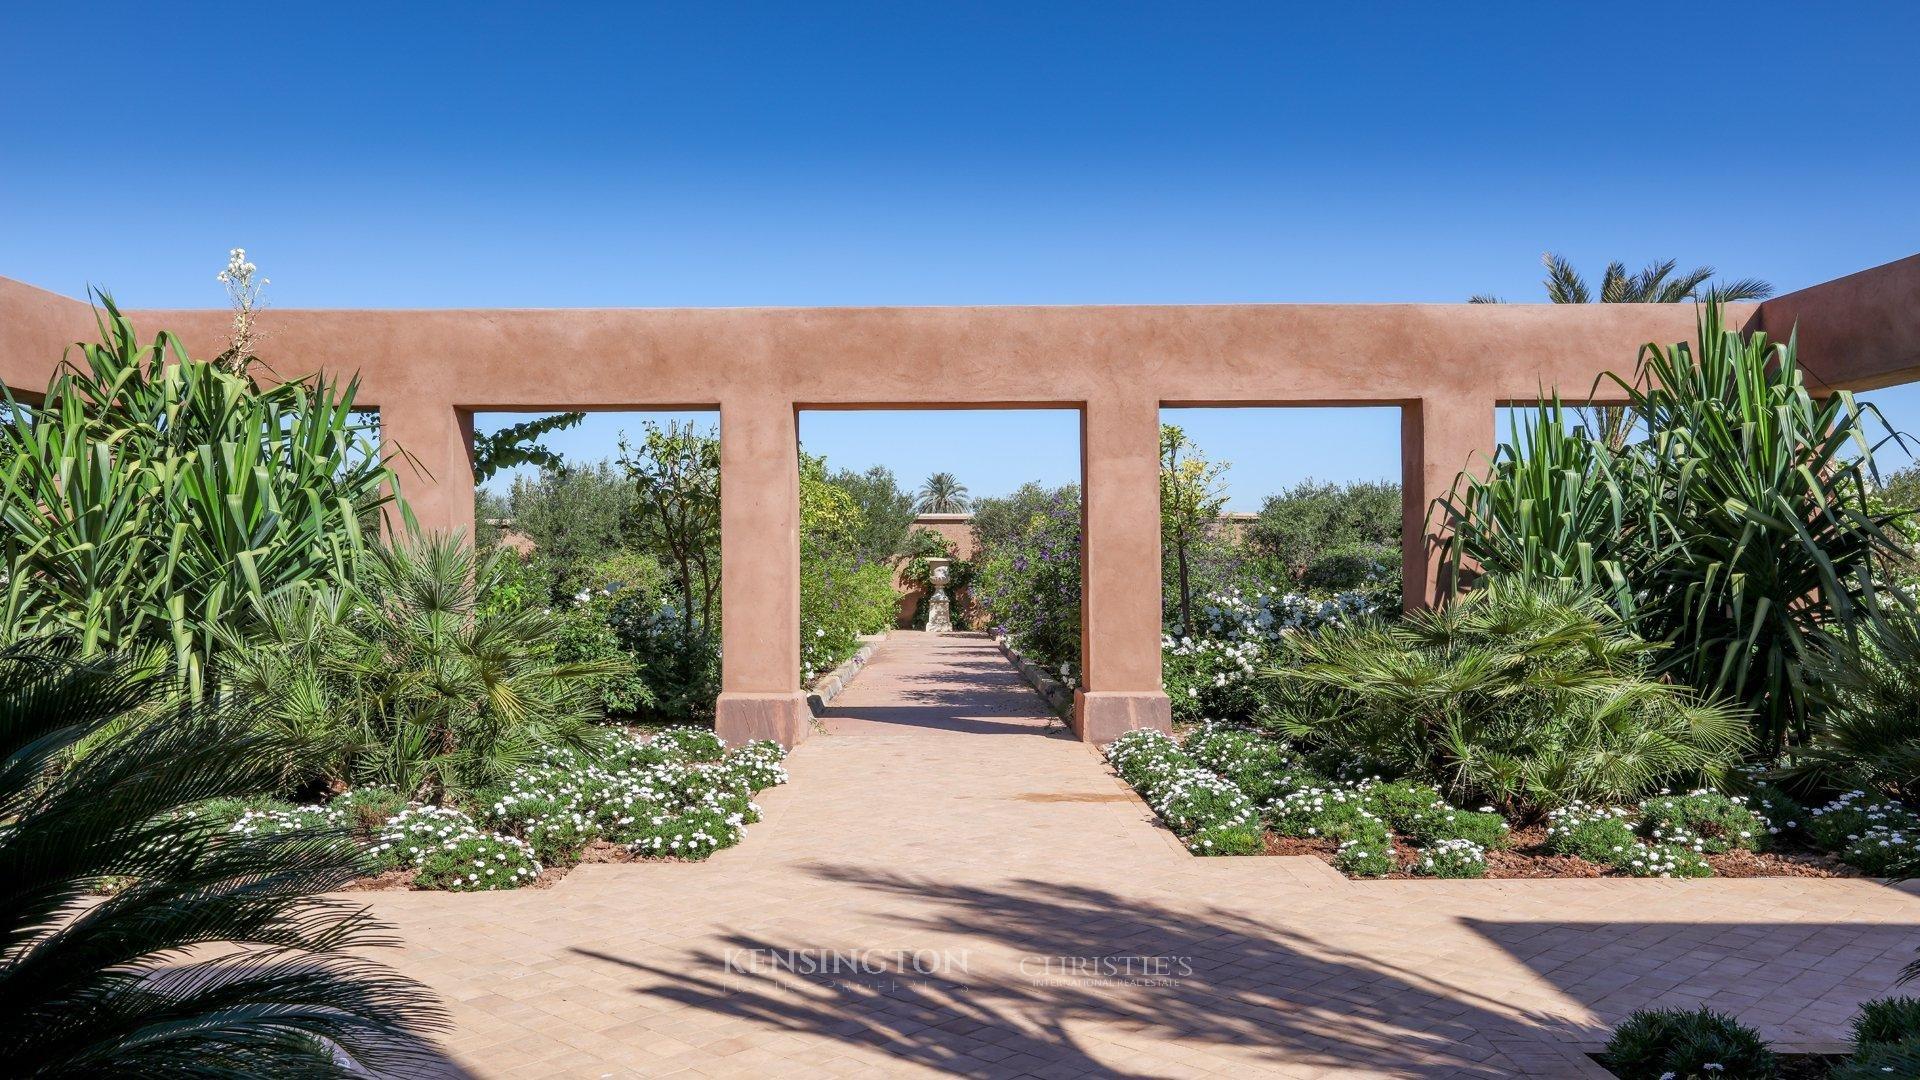 KPPM00644: Luxury Villa development Route de Fes Luxury Villa Marrakech Morocco